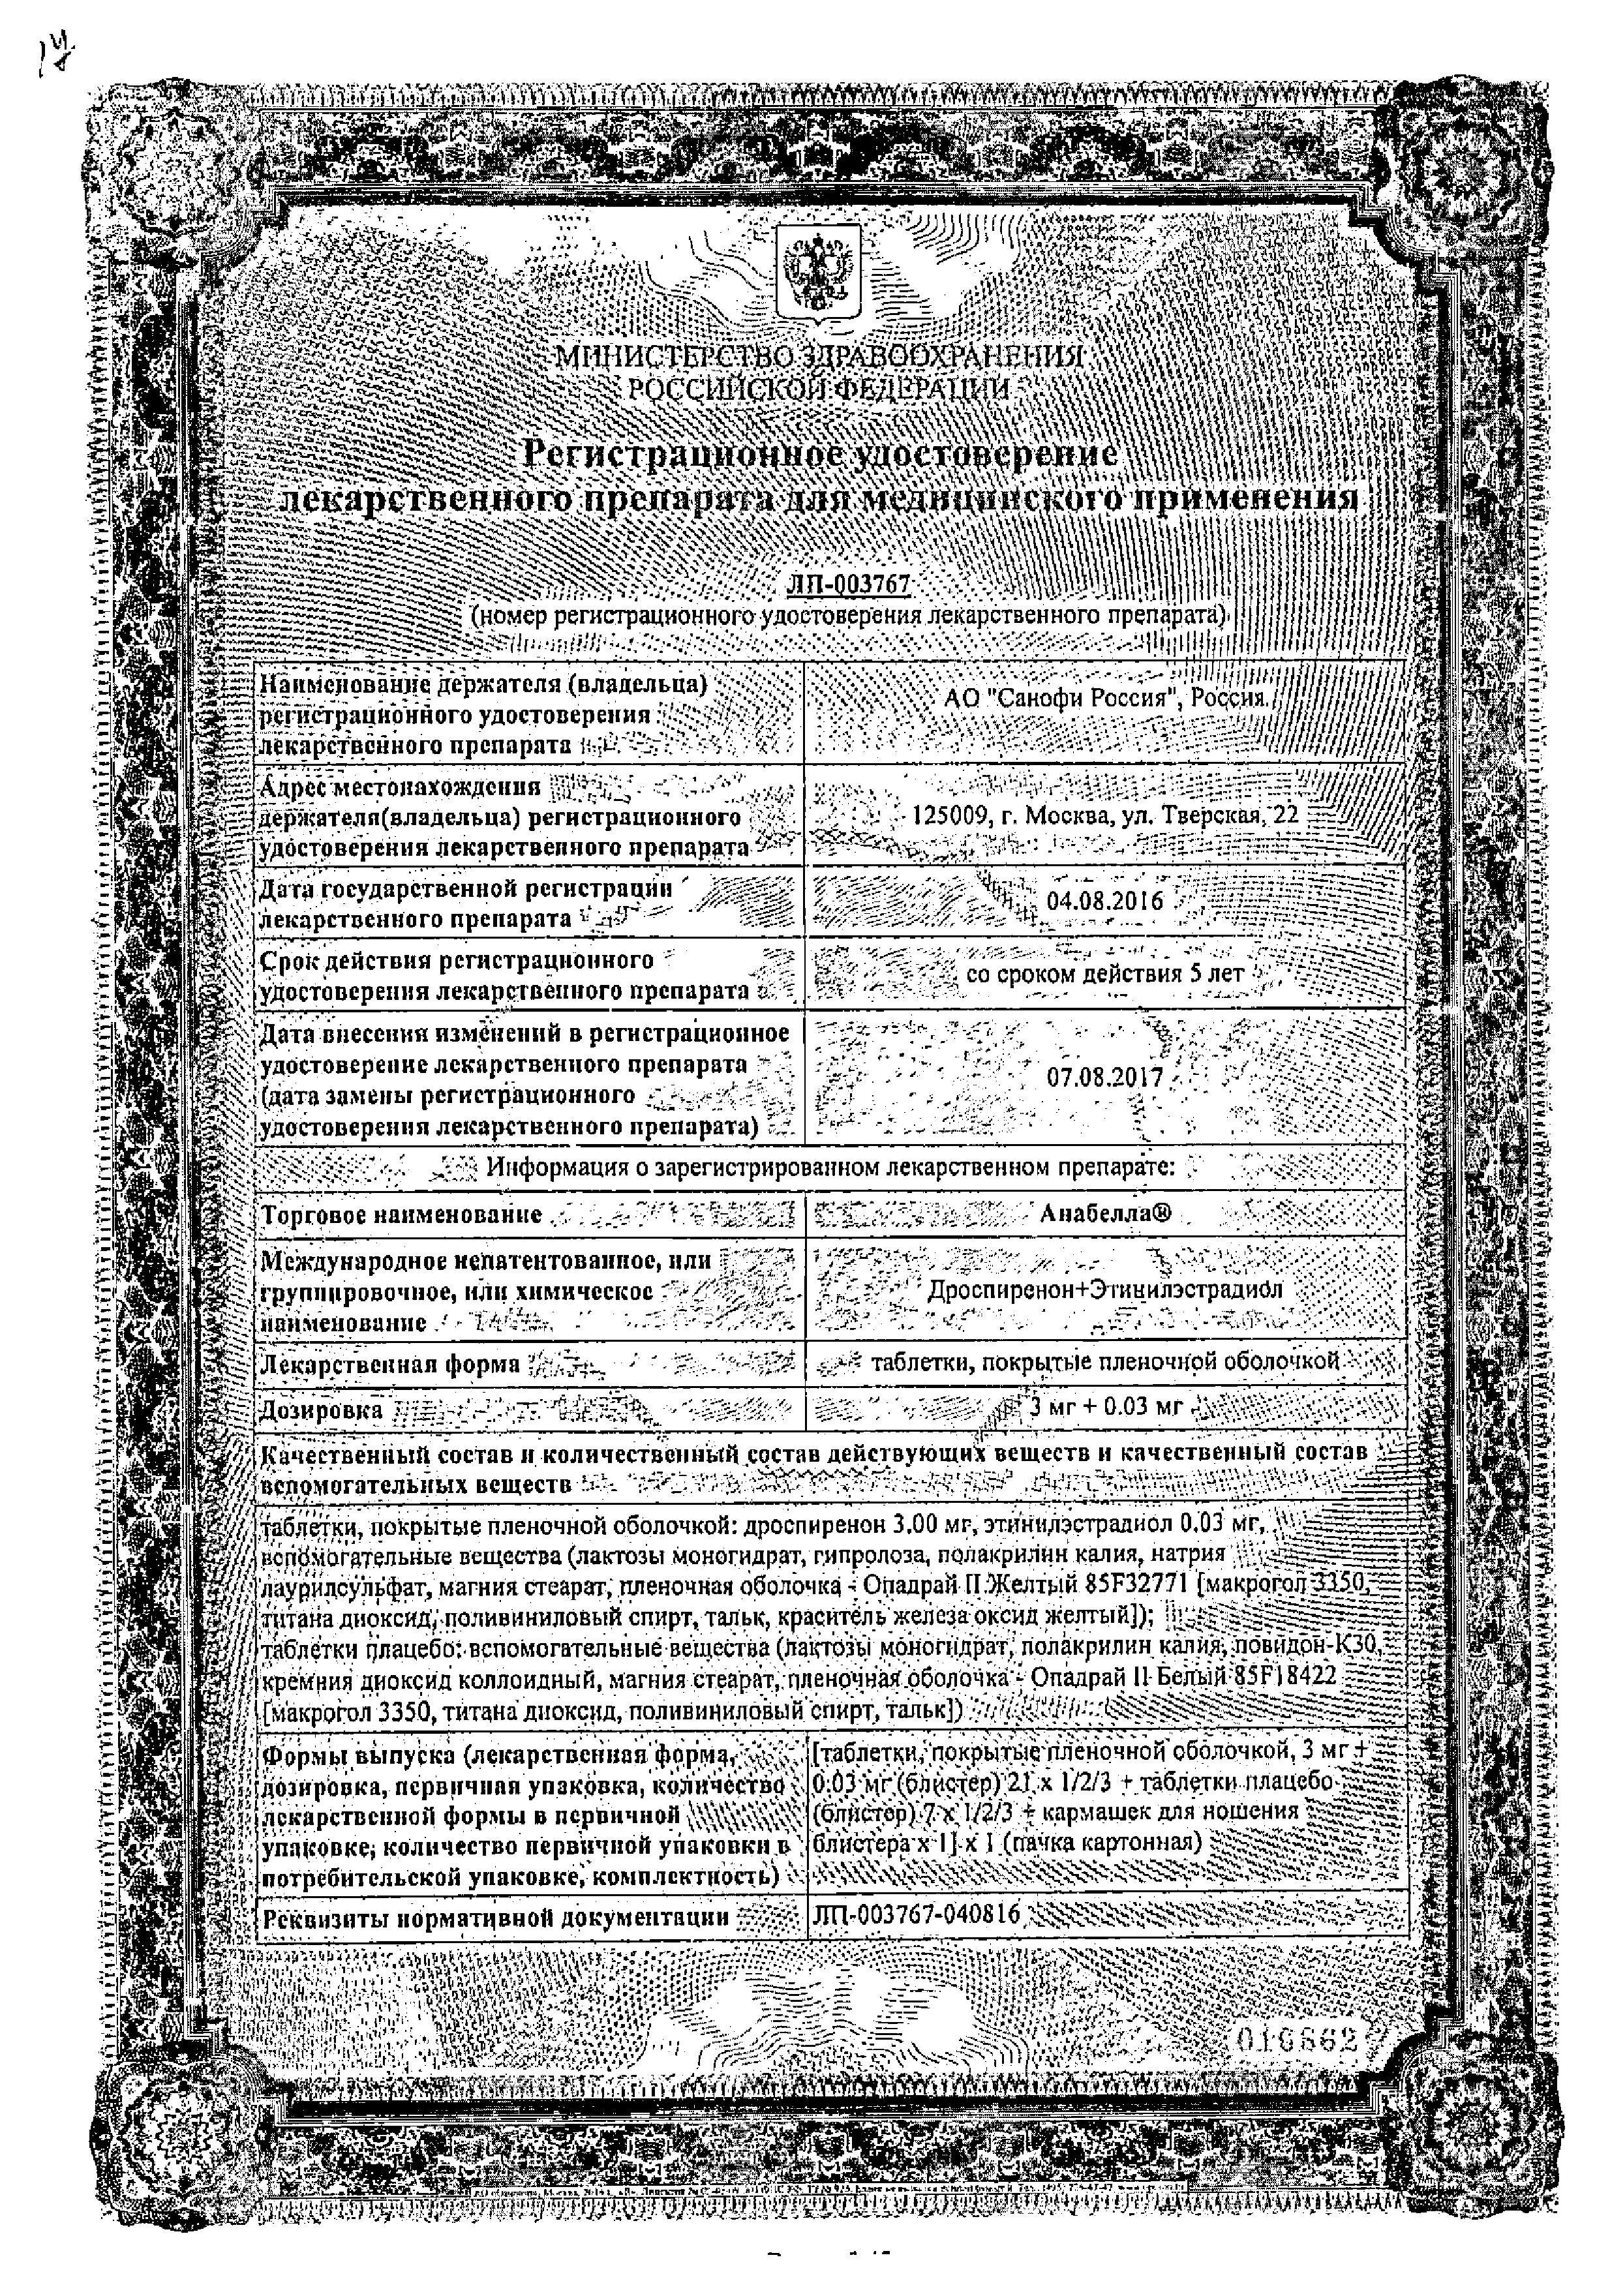 Анабелла сертификат